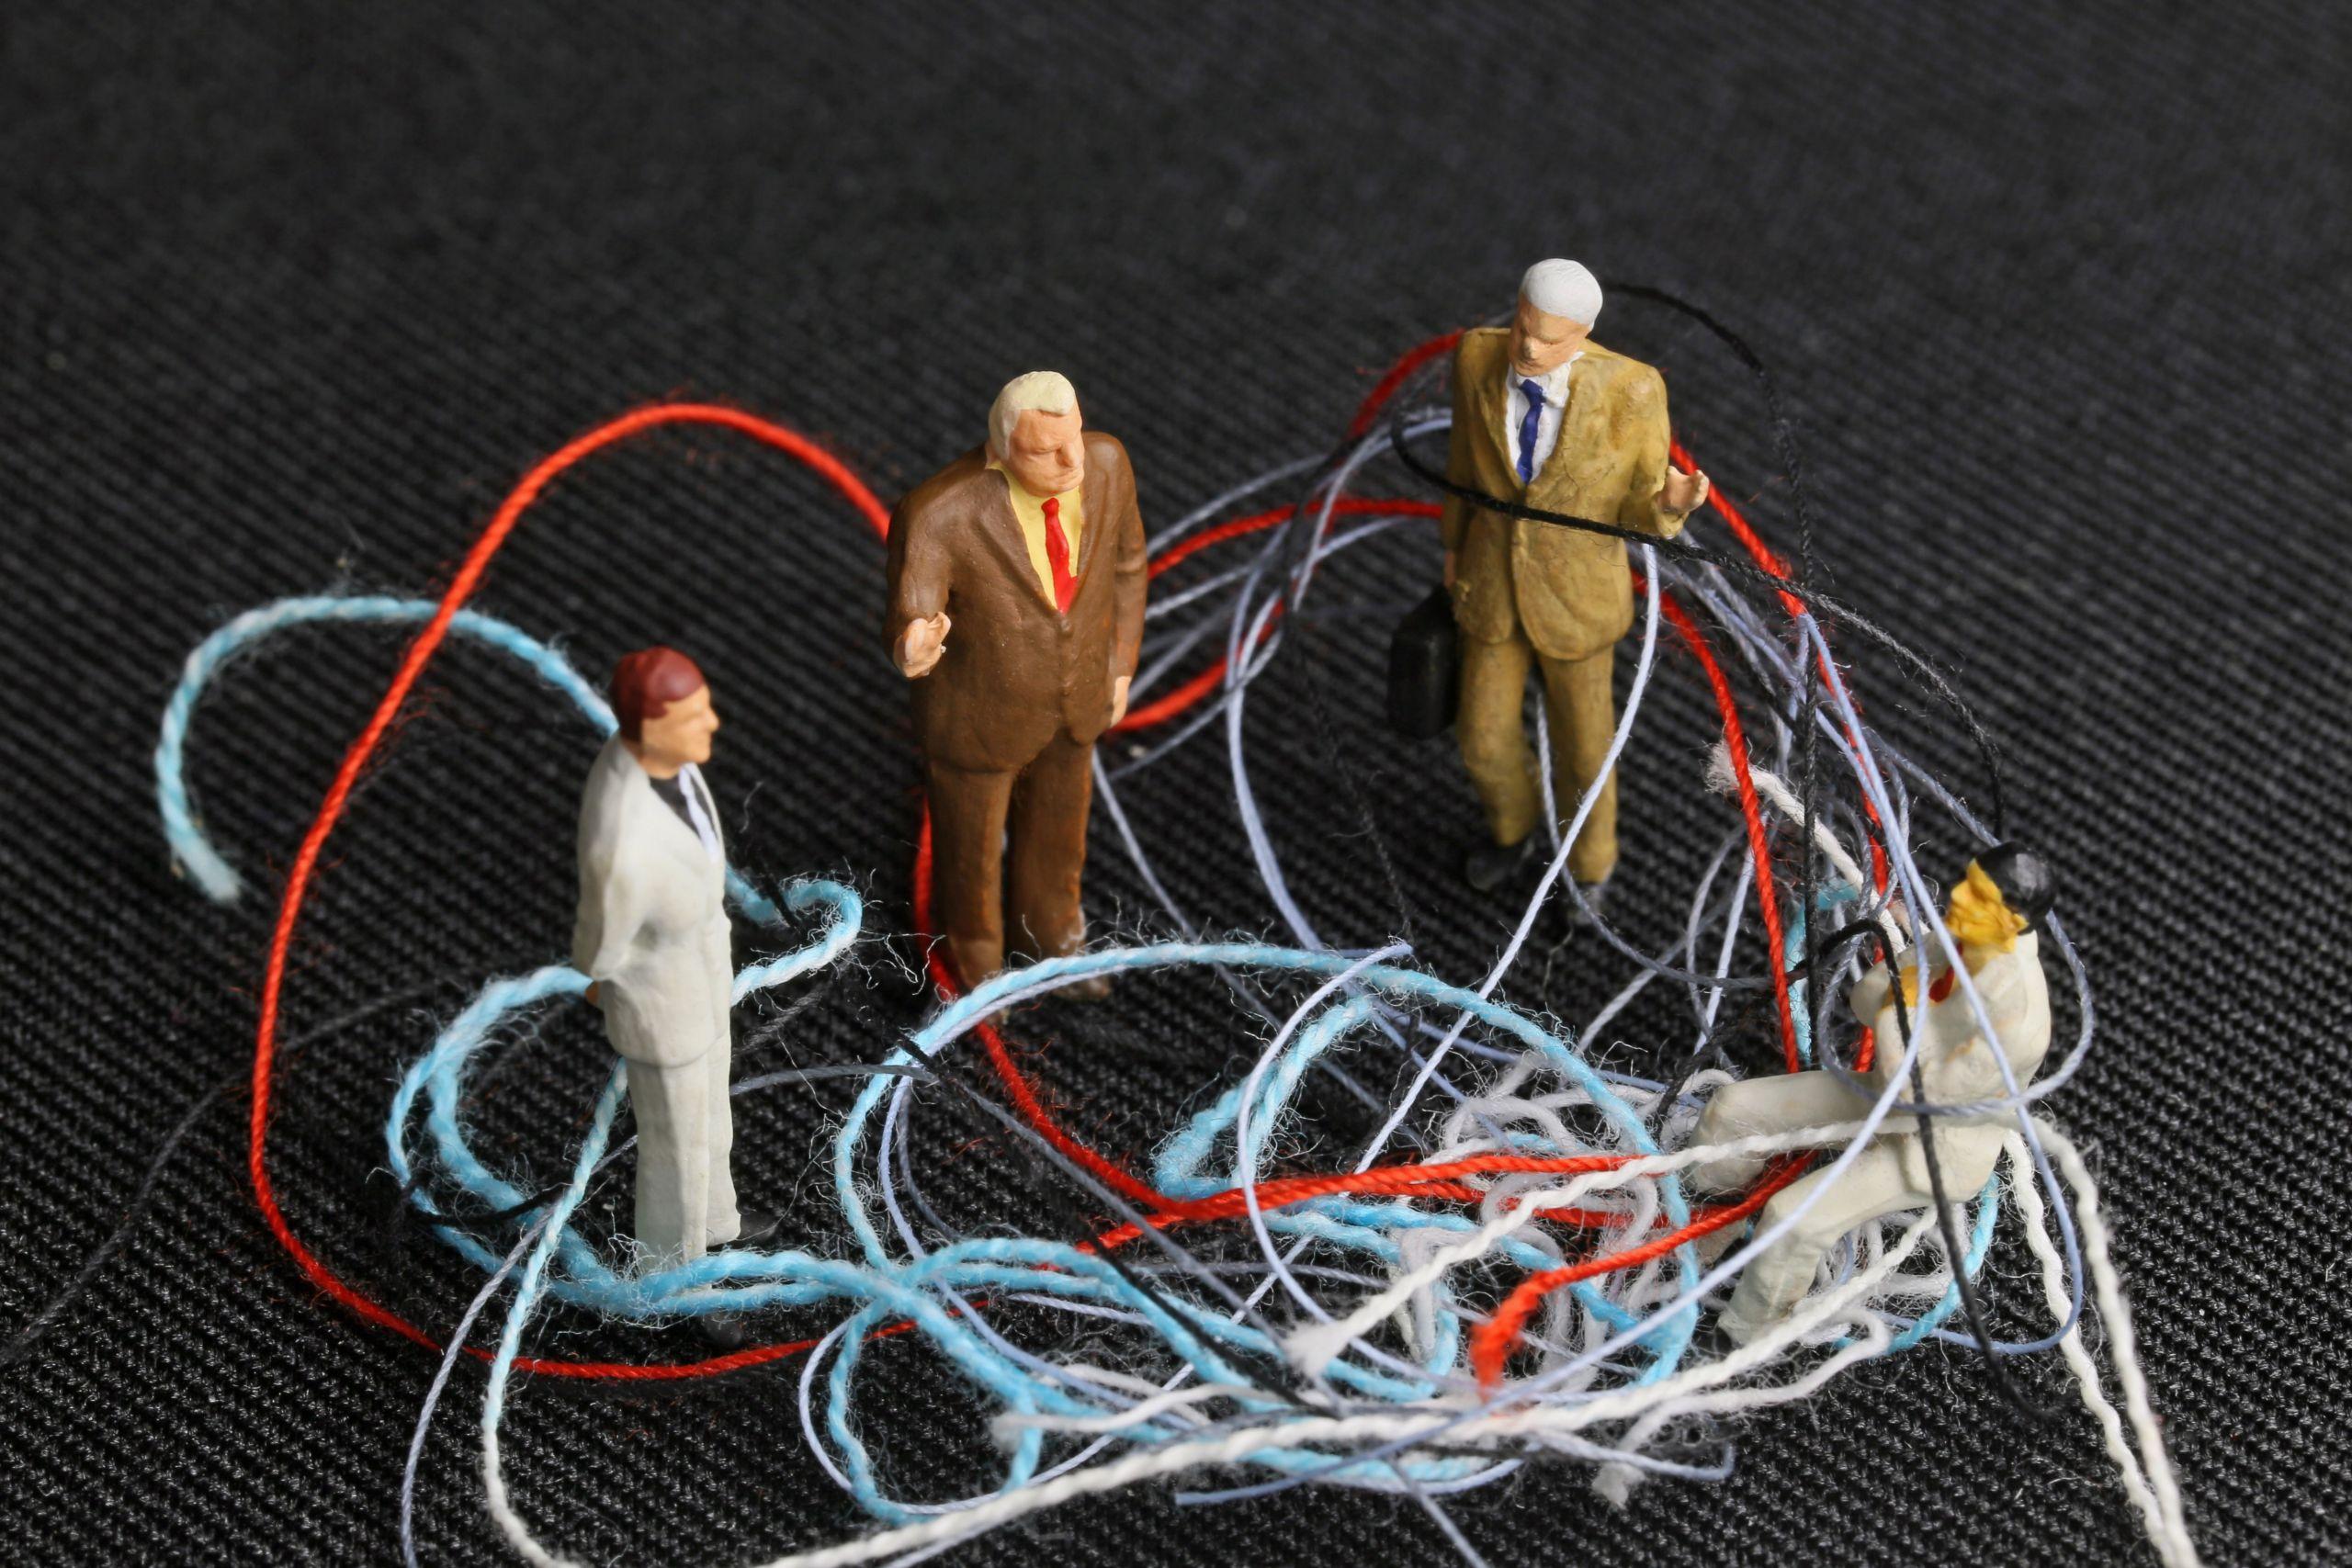 THF goes ONLINE: Στο λαβύρινθο της επικοινωνίας - Για ενήλικες